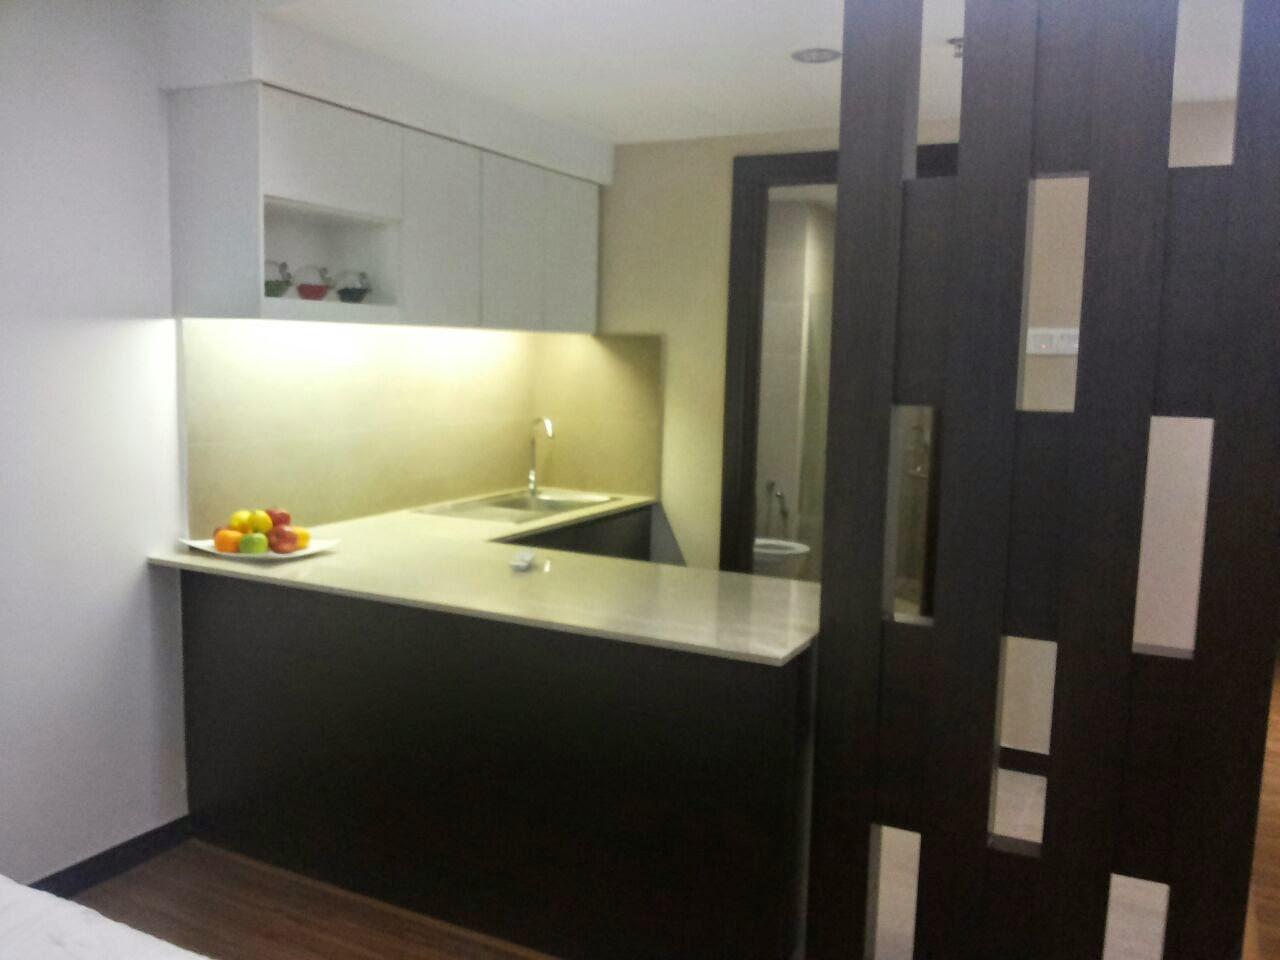 Studio Apartment Untuk Disewa exellent studio apartment untuk disewa s intended inspiration